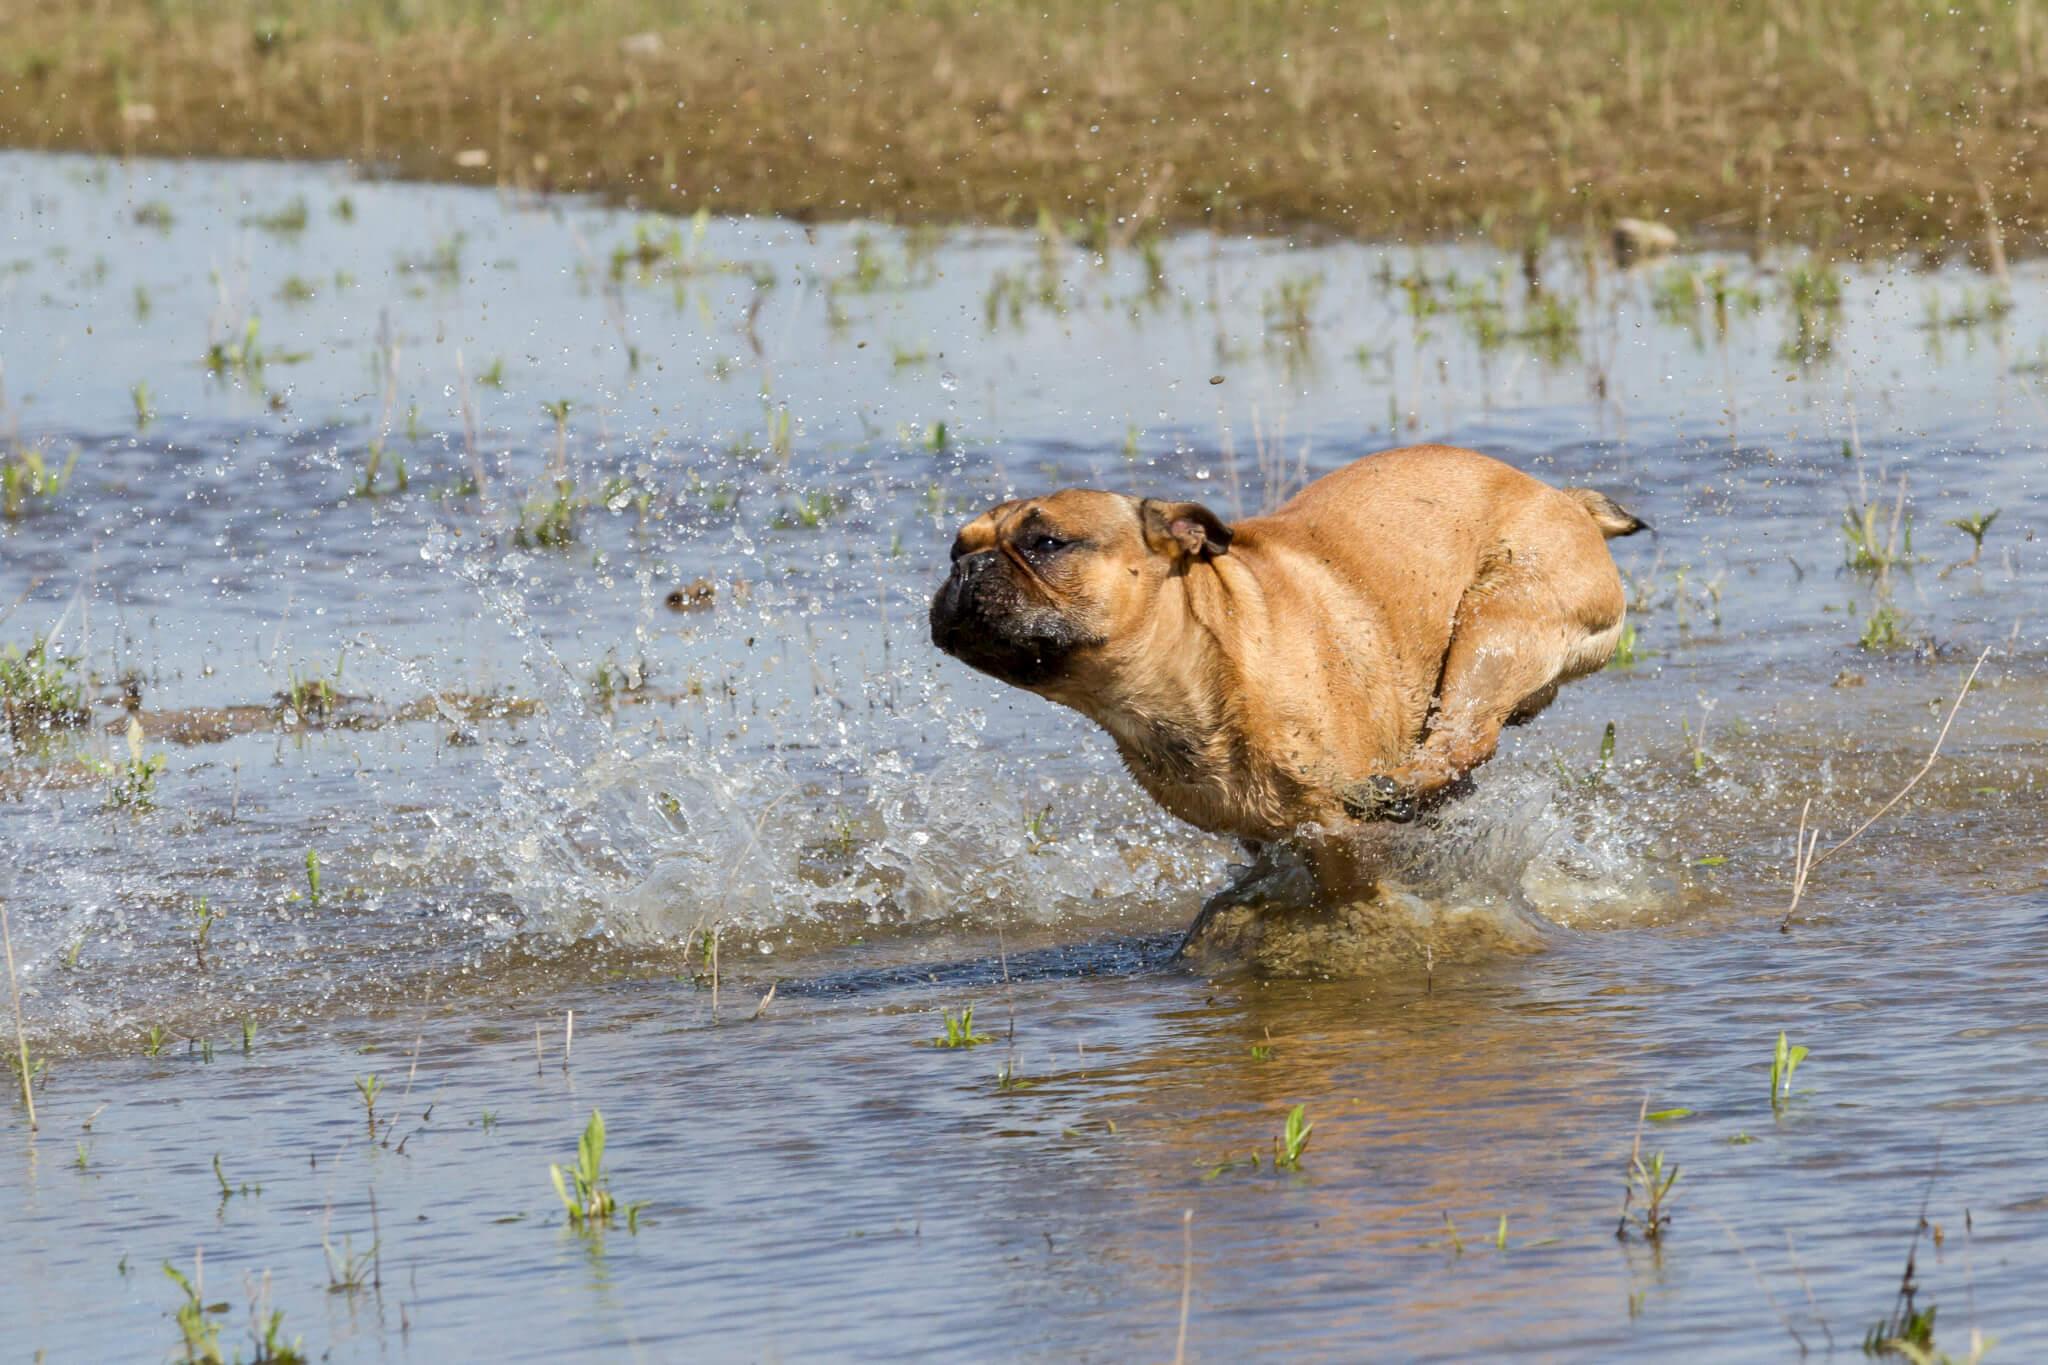 franse bulldog in het water